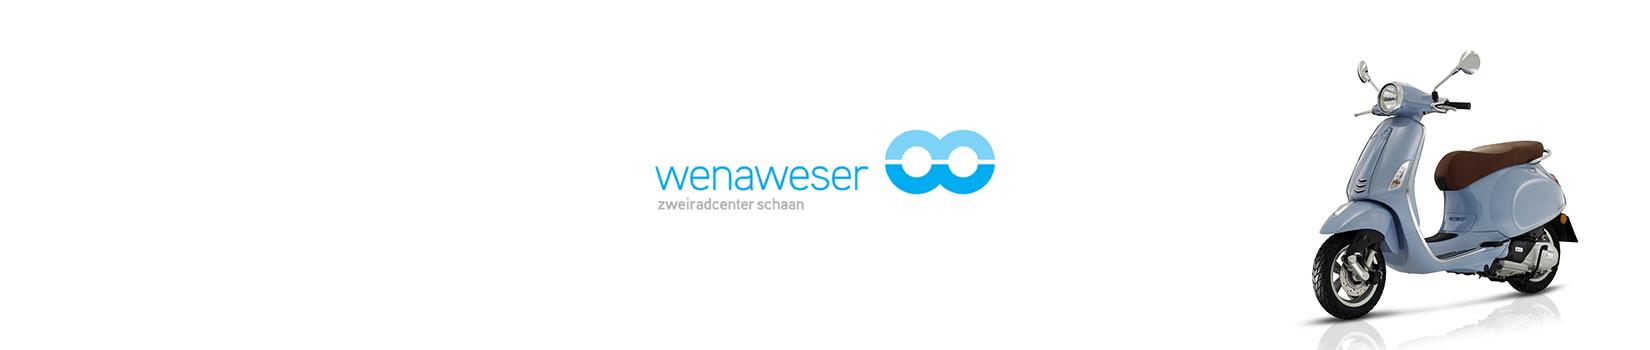 wenaweser.li